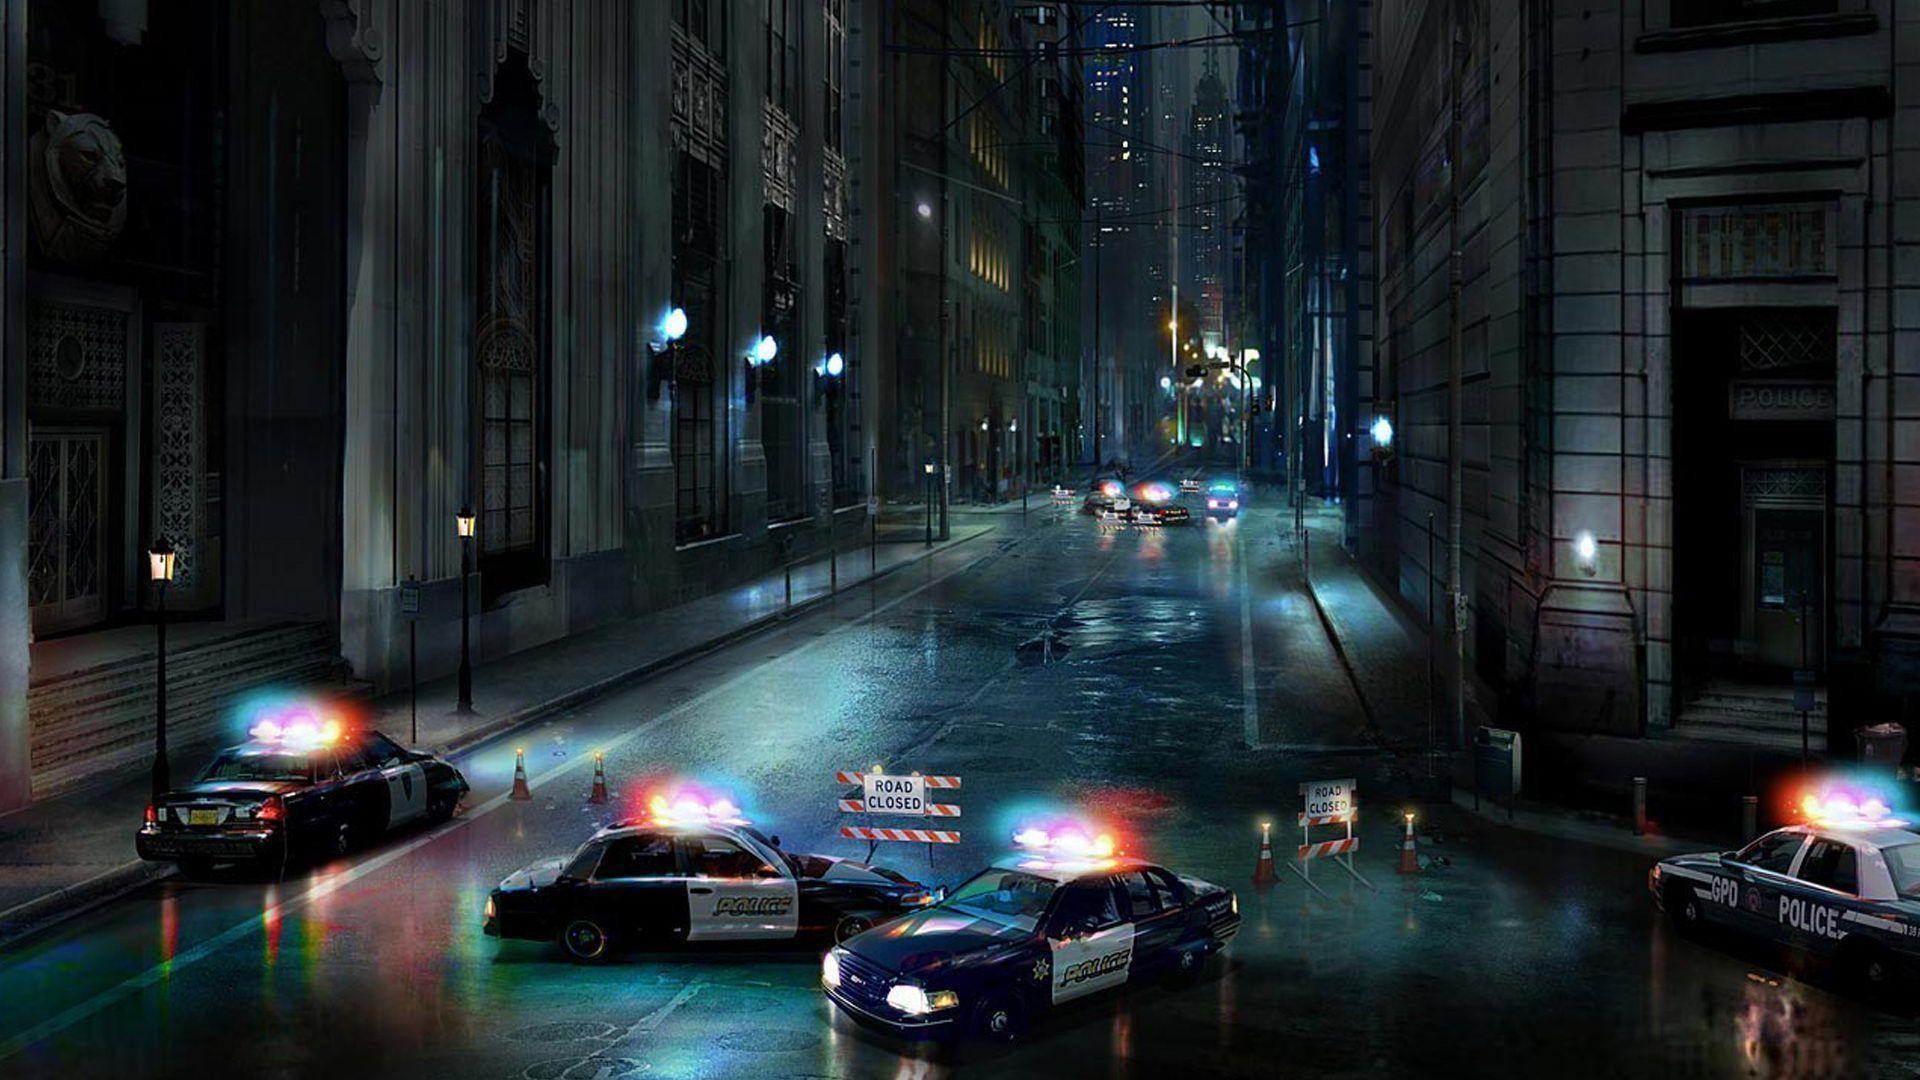 Filename: ykQZDJf.jpg · view image. Found on: gotham-city-background